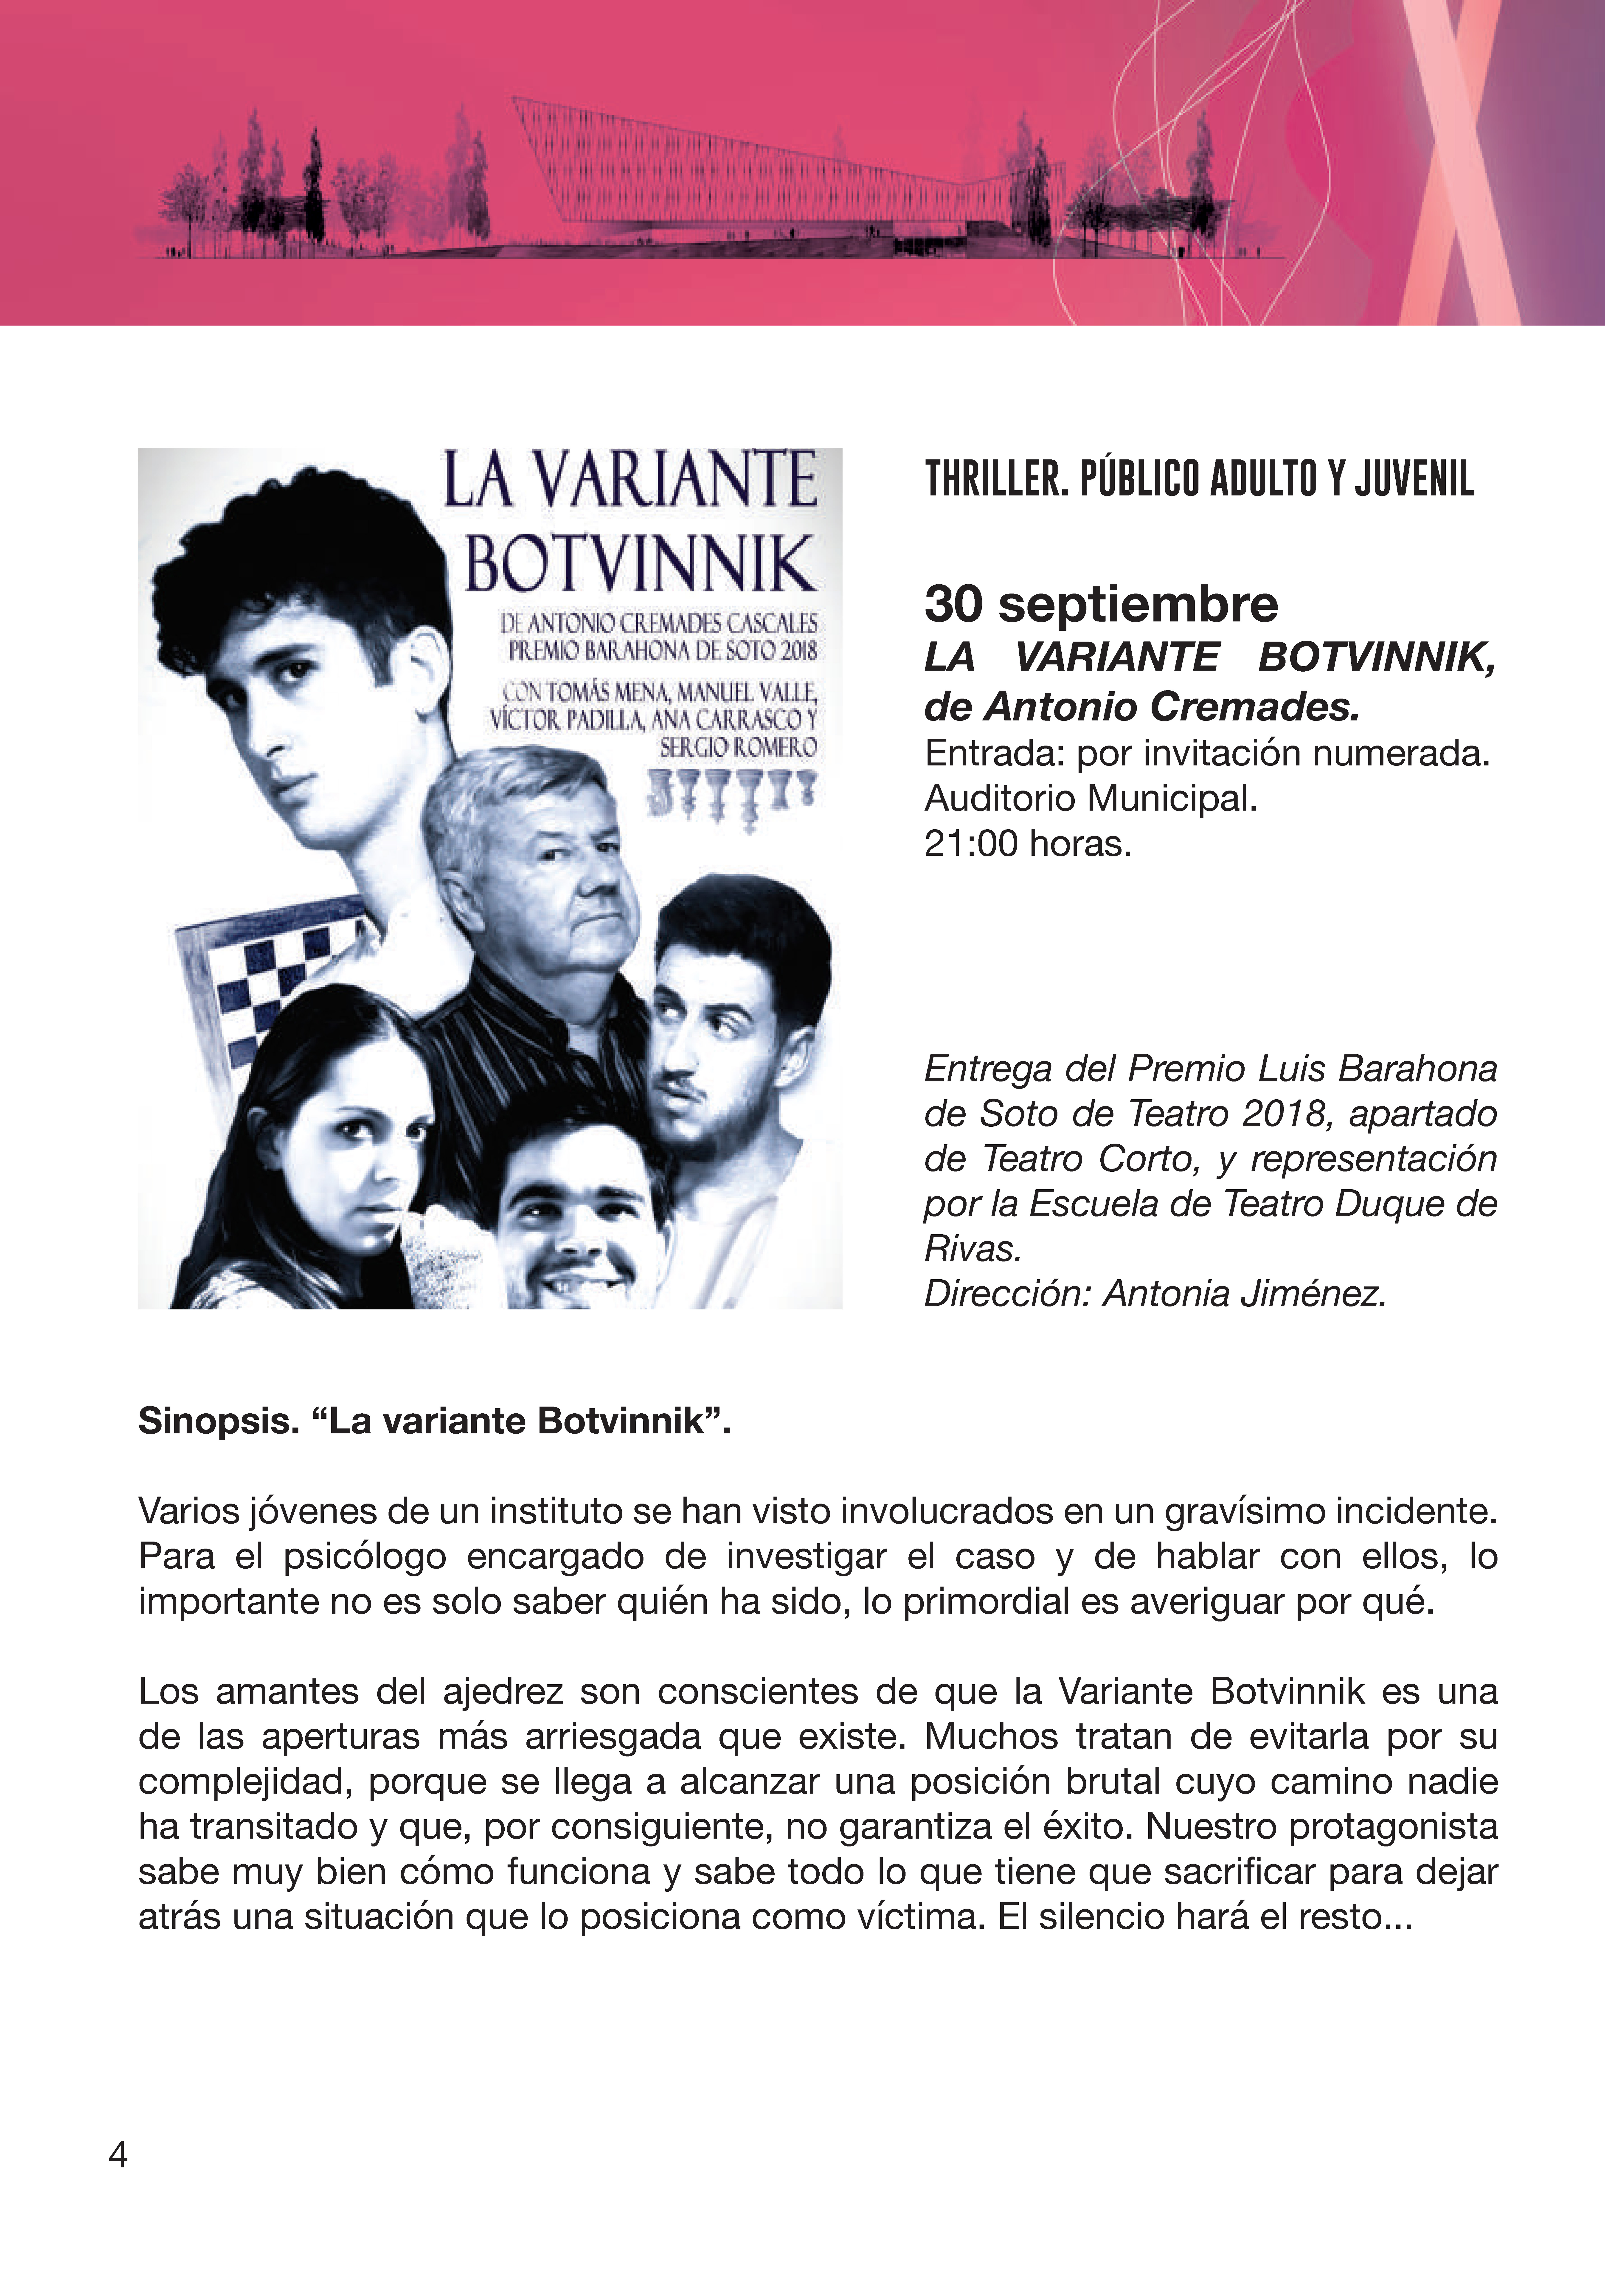 LA VARIANTE BOTVINNIK, de Antonio Cremades. @ Auditorio Municipal